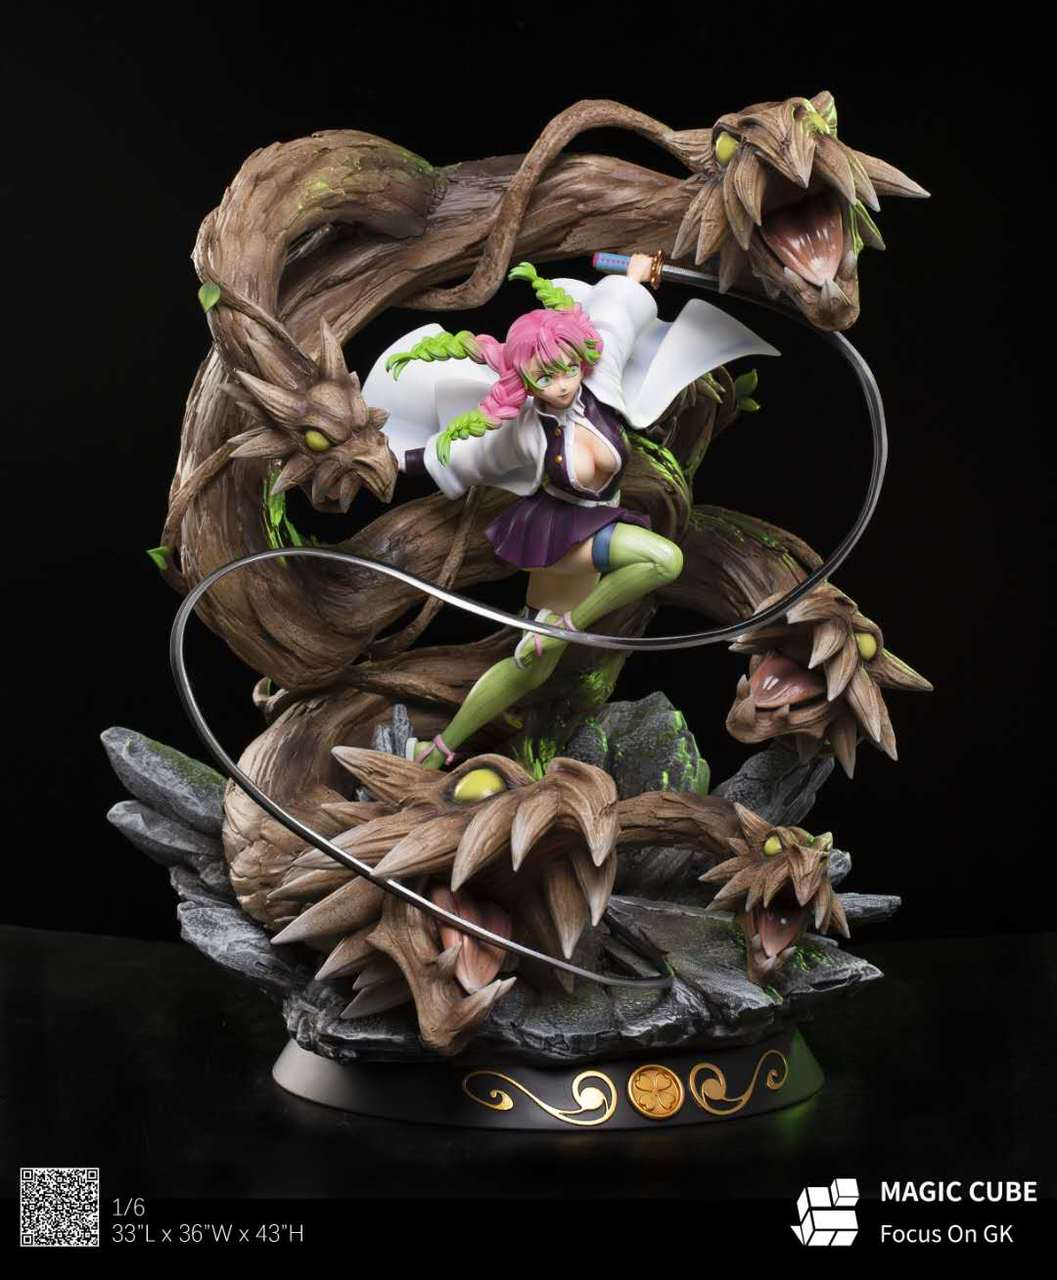 Image of MagicCube Studio Kanroji Mitsuri 1/6 resin statue